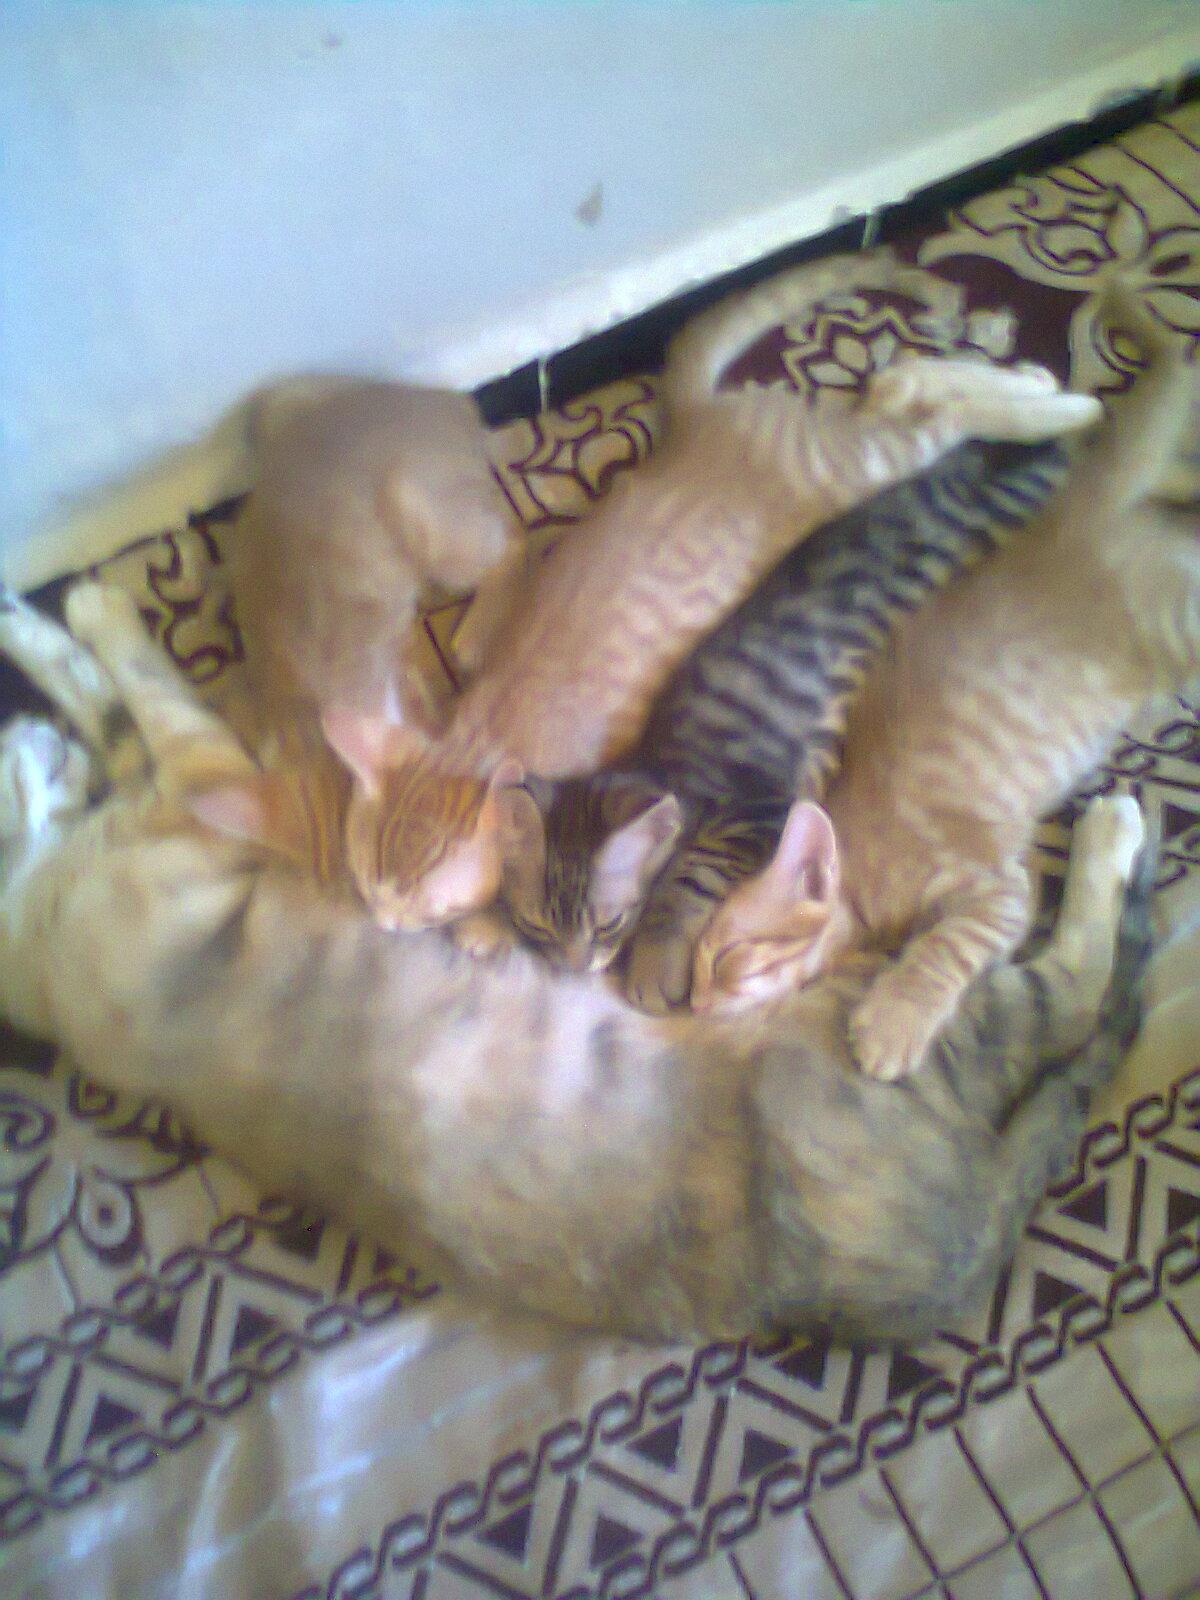 aimg.tgareed.com_imgcache_1078678.